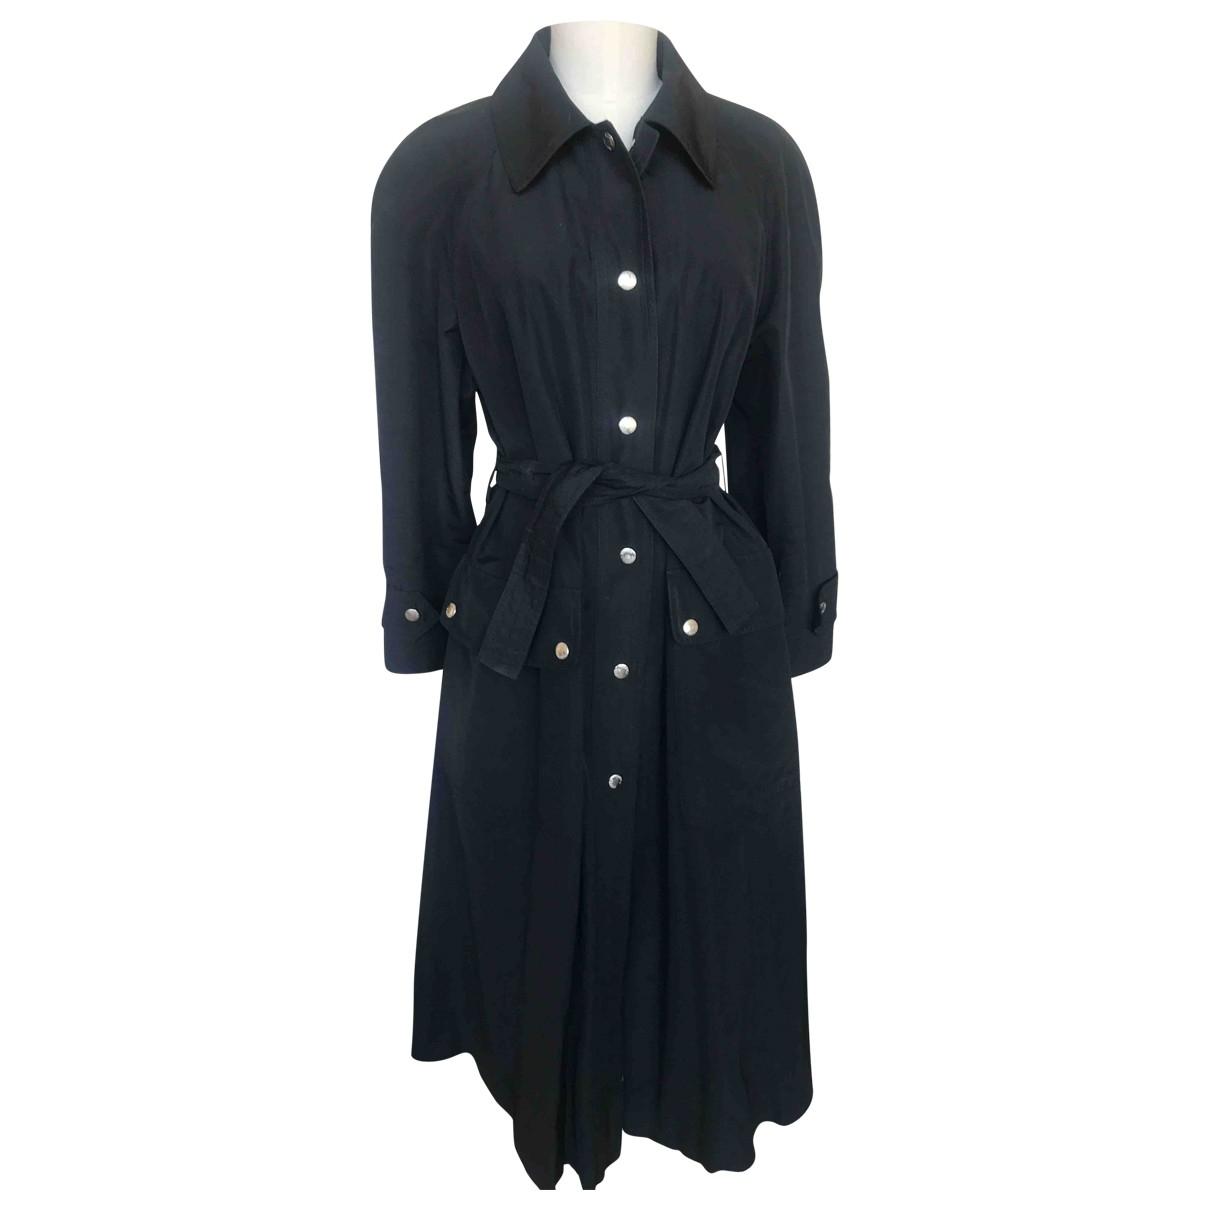 Prada \N Black Trench coat for Women 42 IT